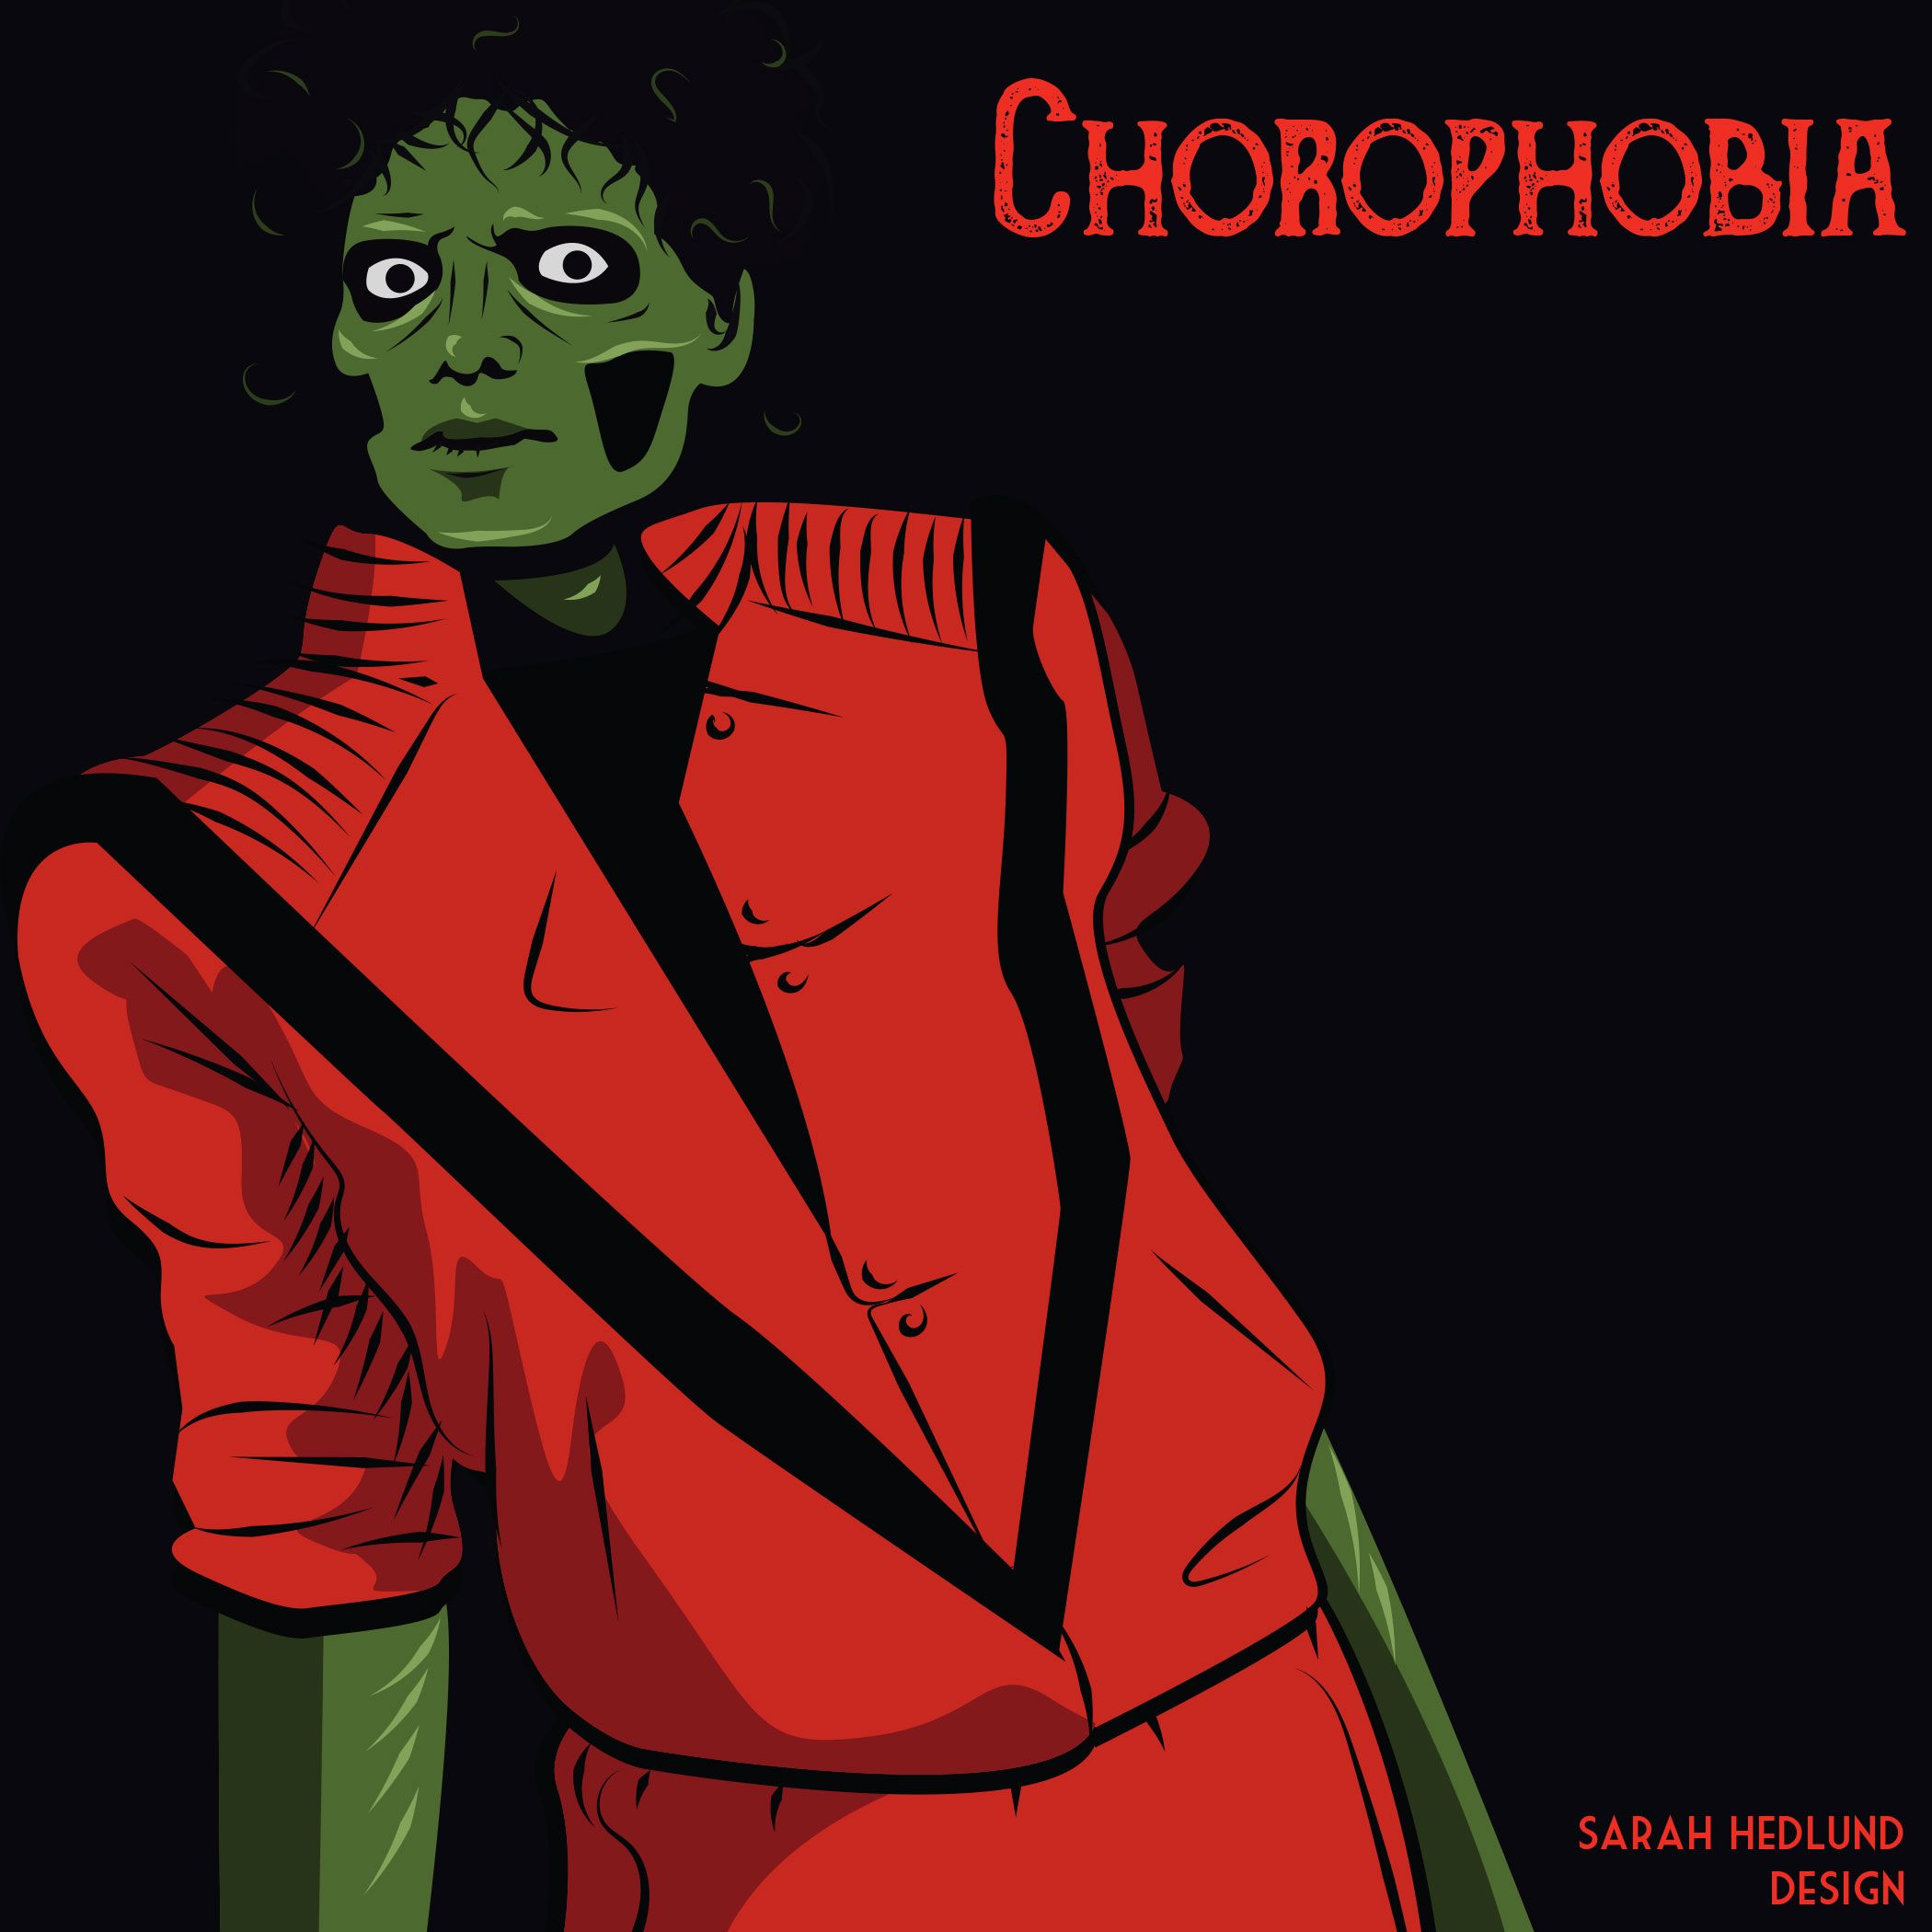 sarah hedlund 31 days of phobias - Phobia Halloween